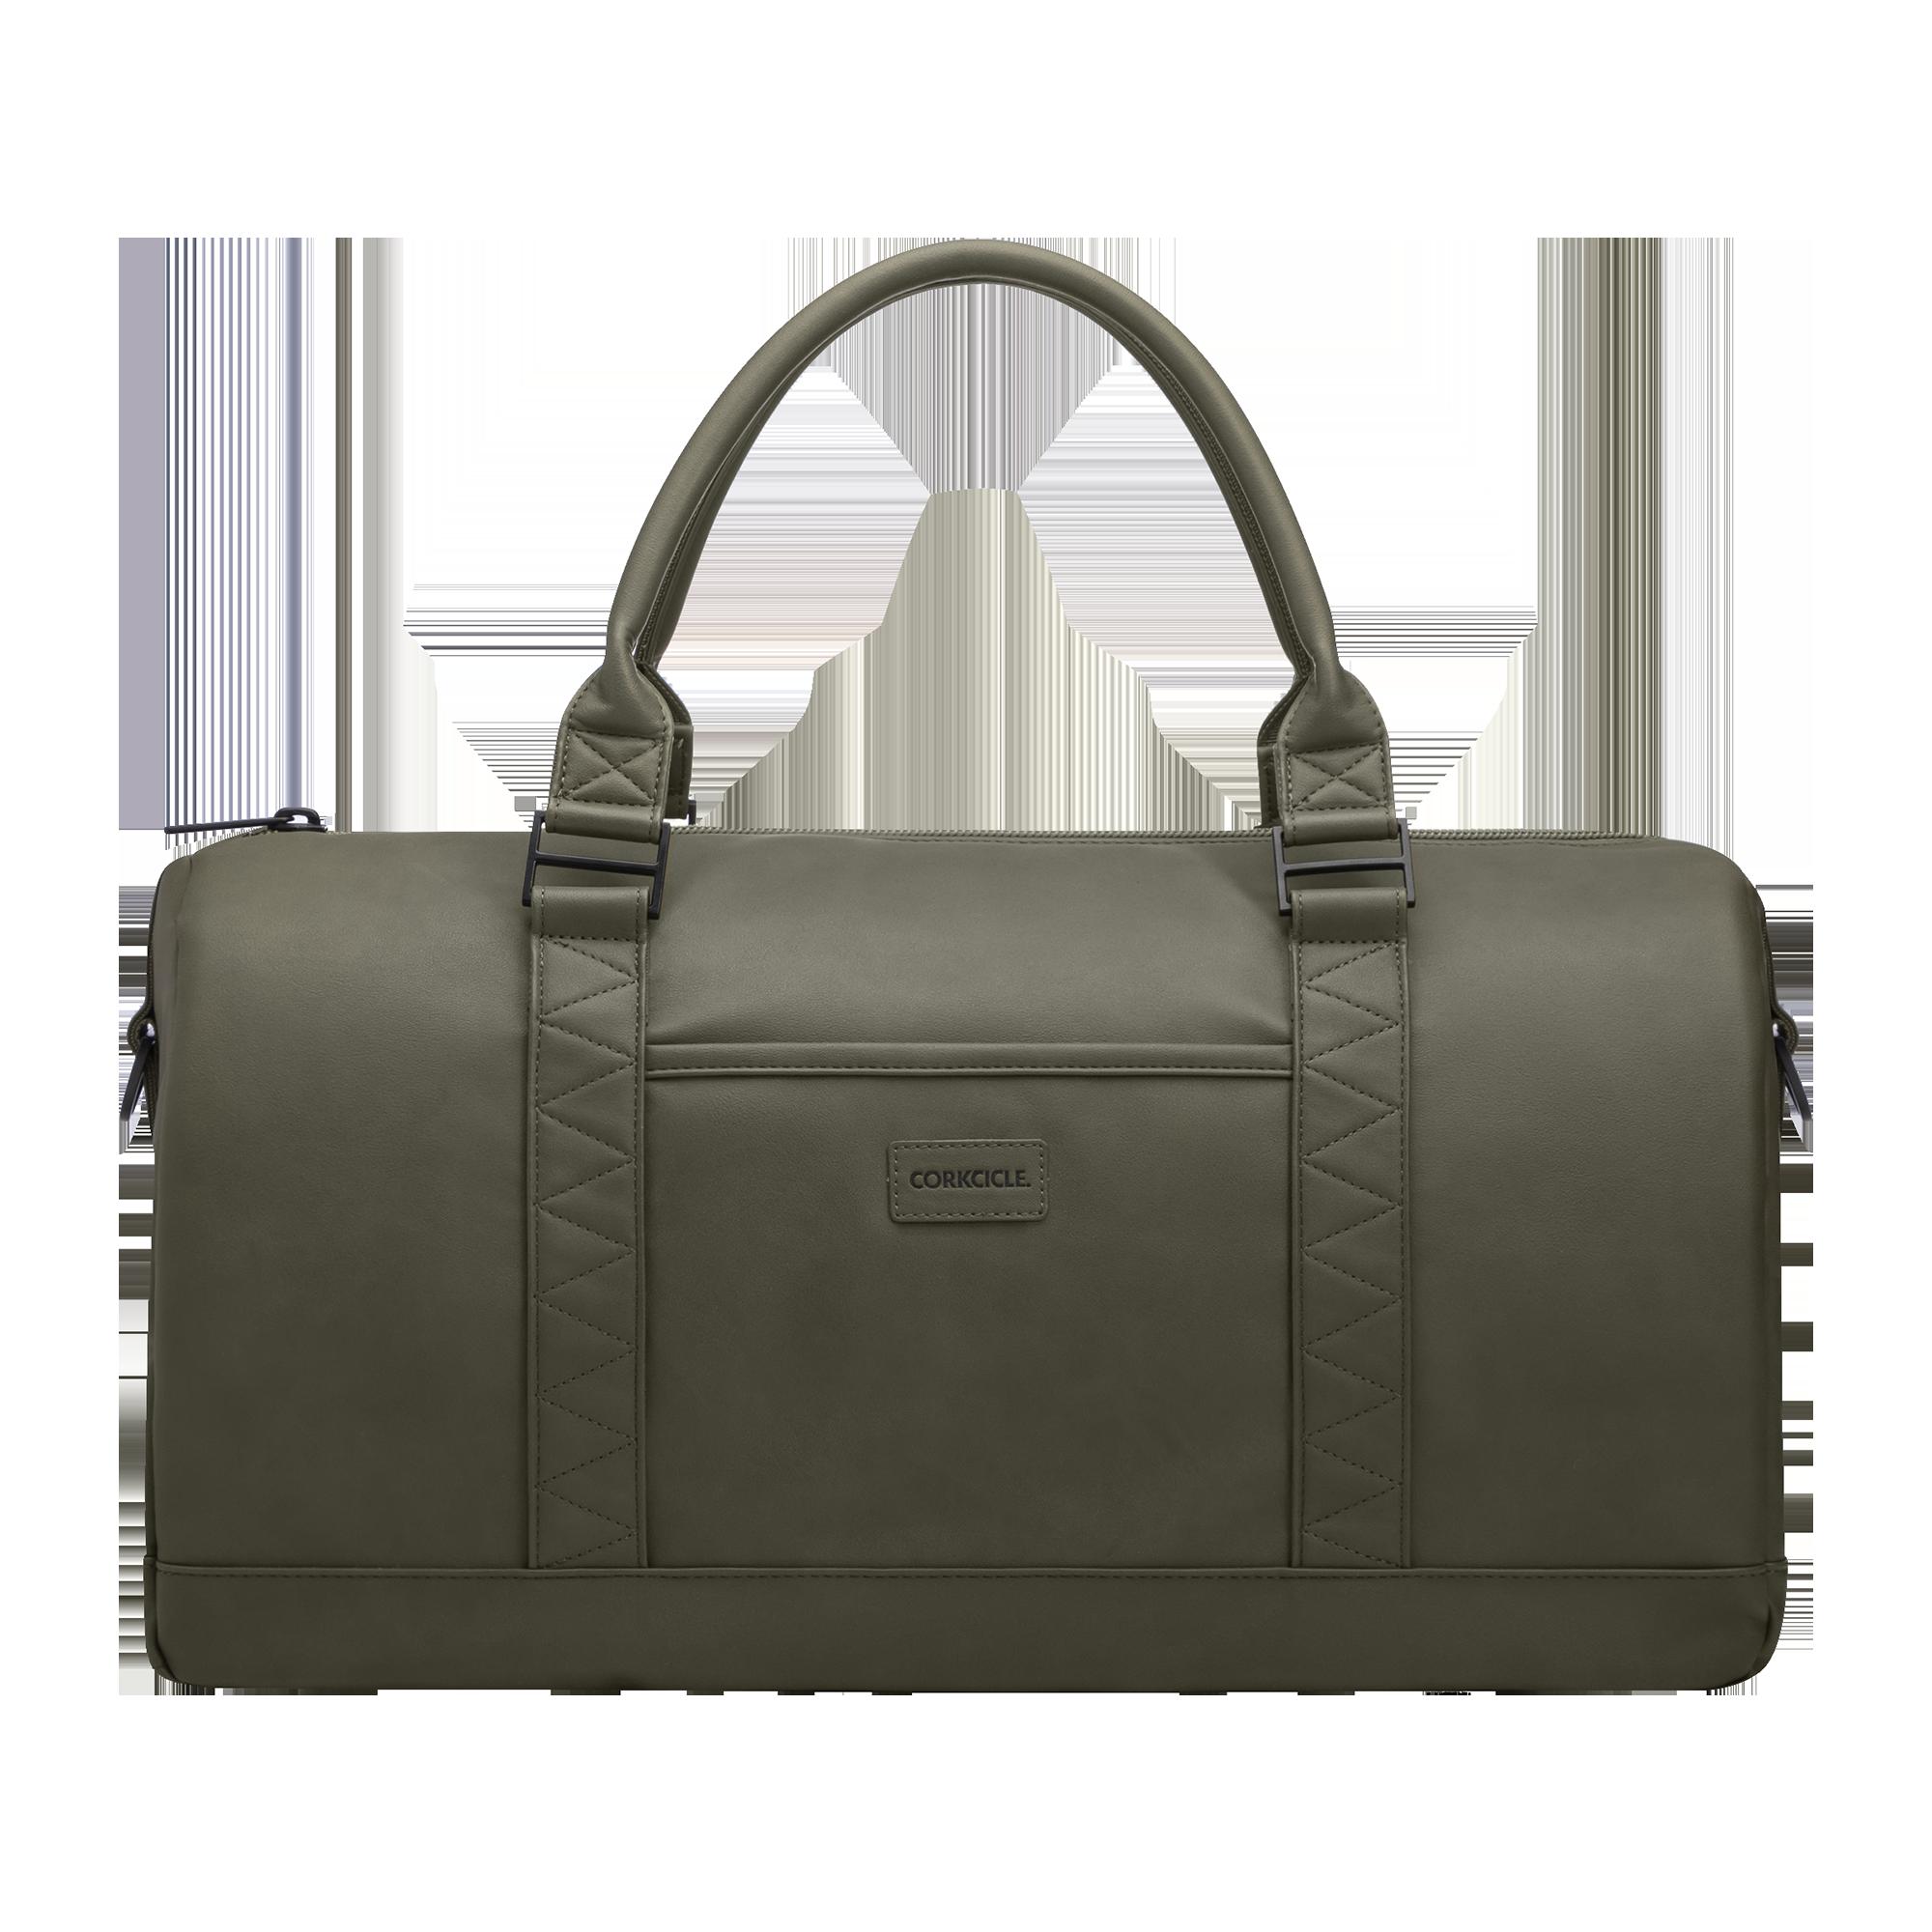 bag product photo